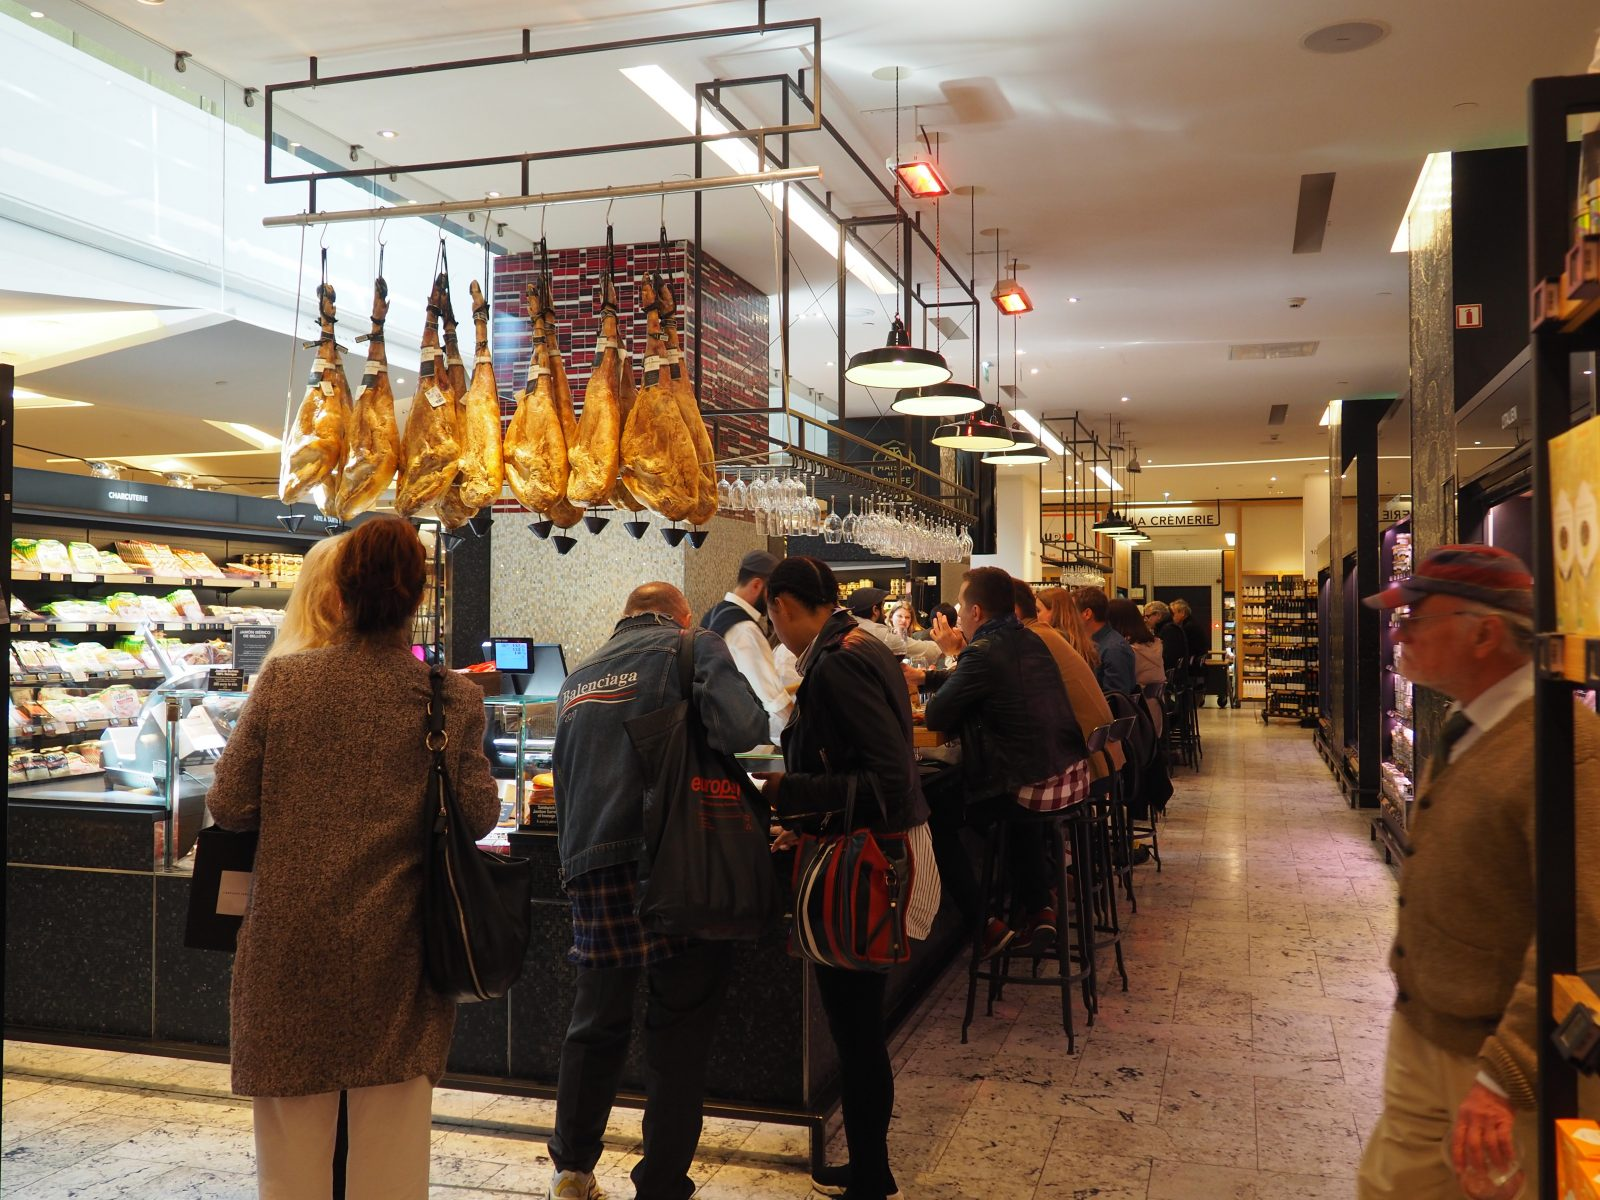 La_Grande_Epicerie_paris_køkkentøj